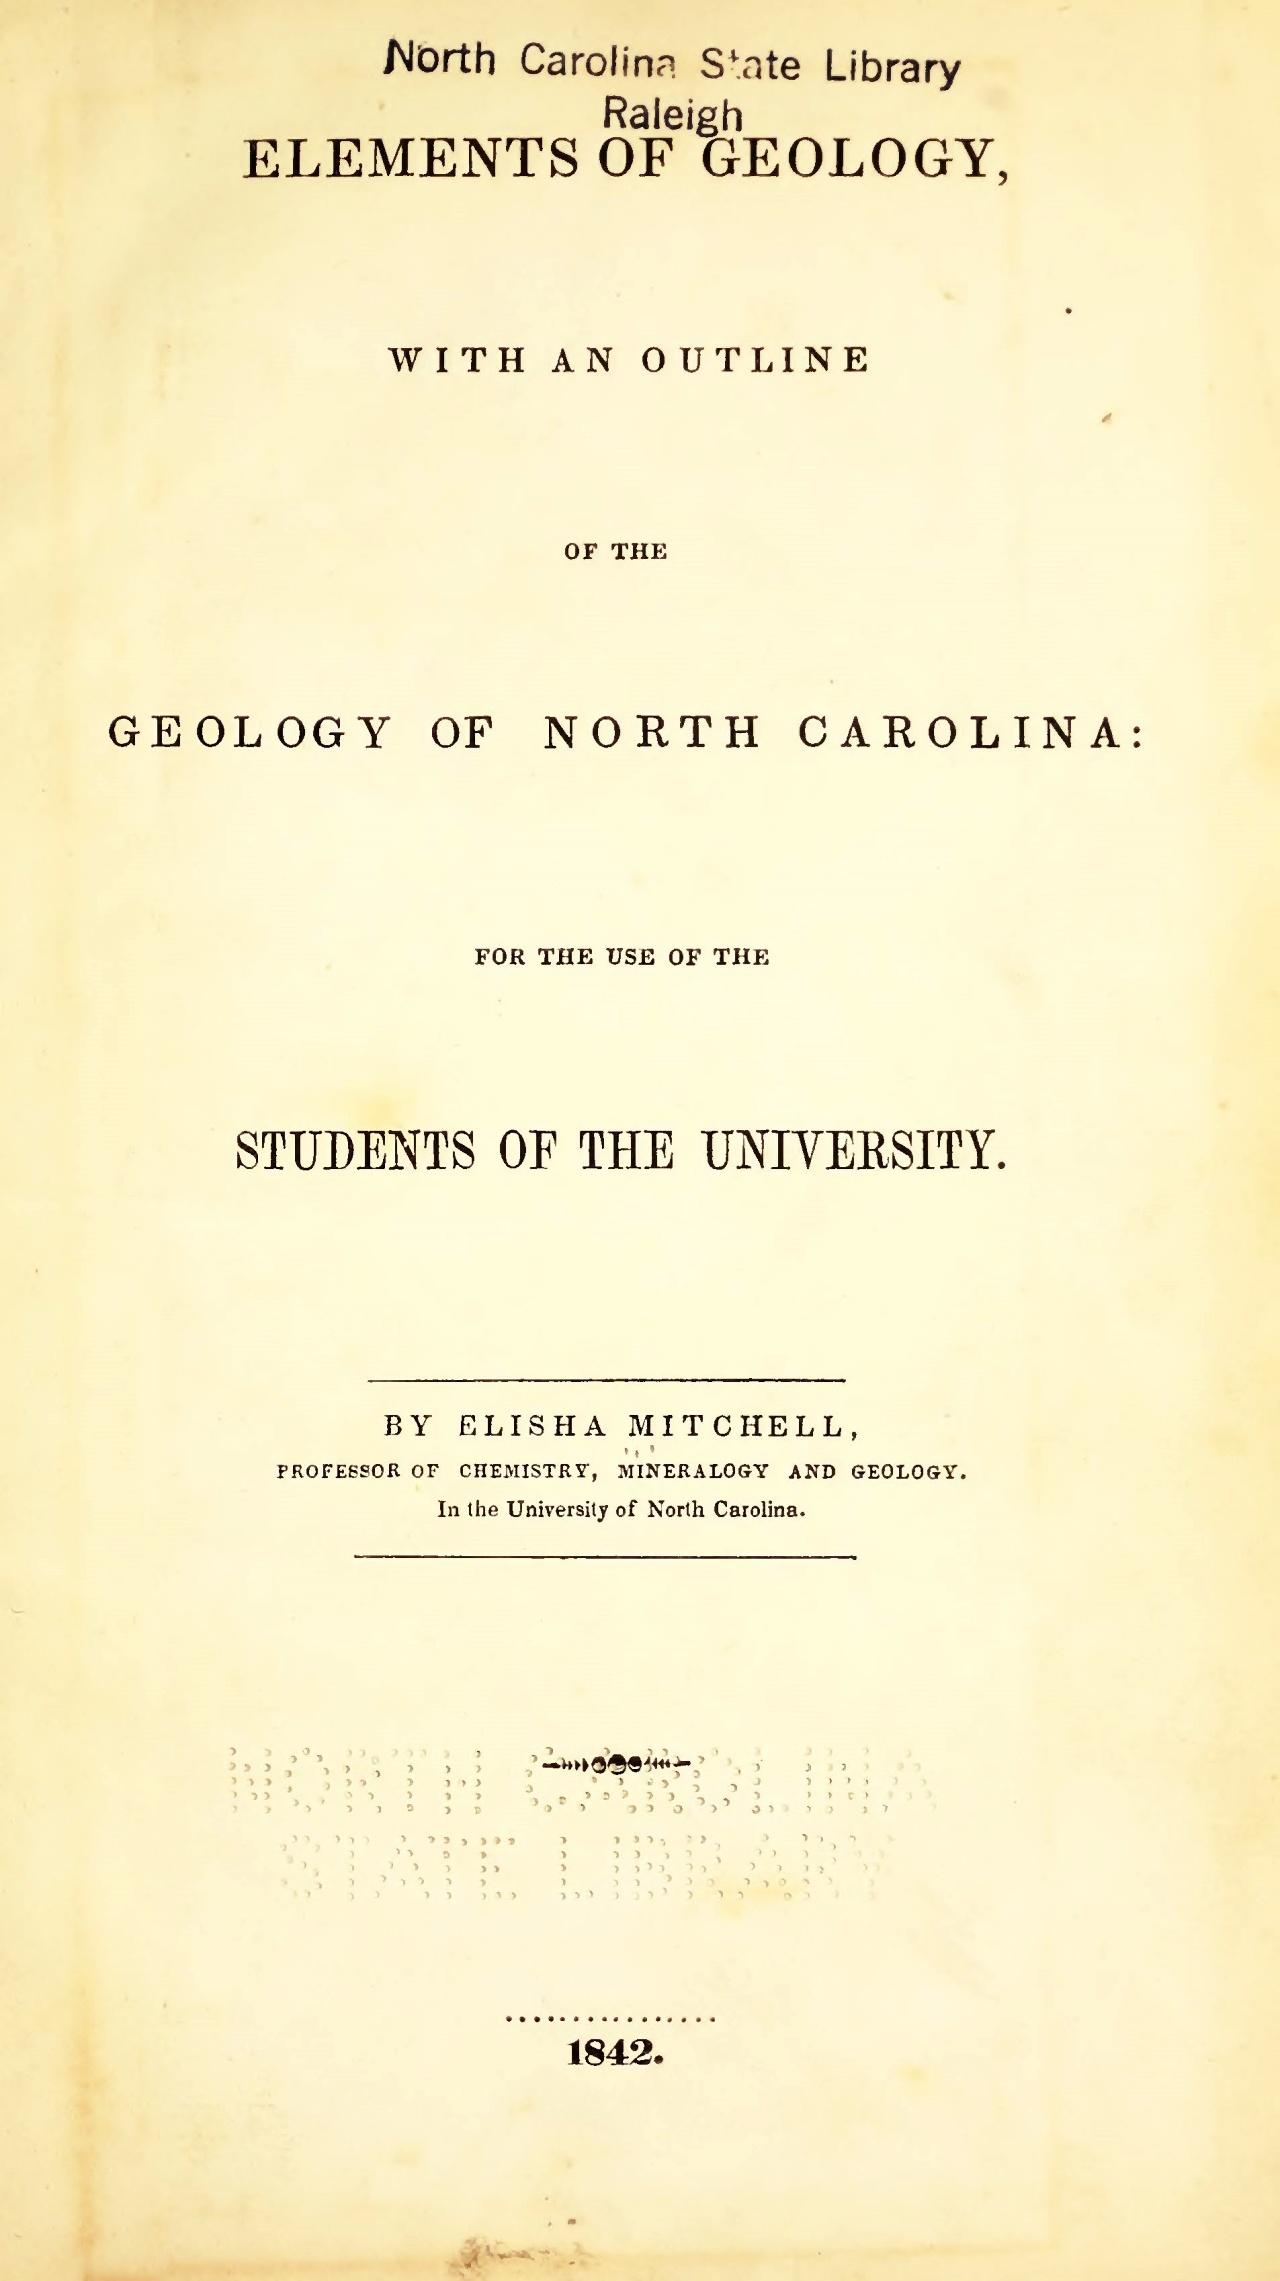 Mitchell, Elisha, Elements of Geology Title Page.jpg